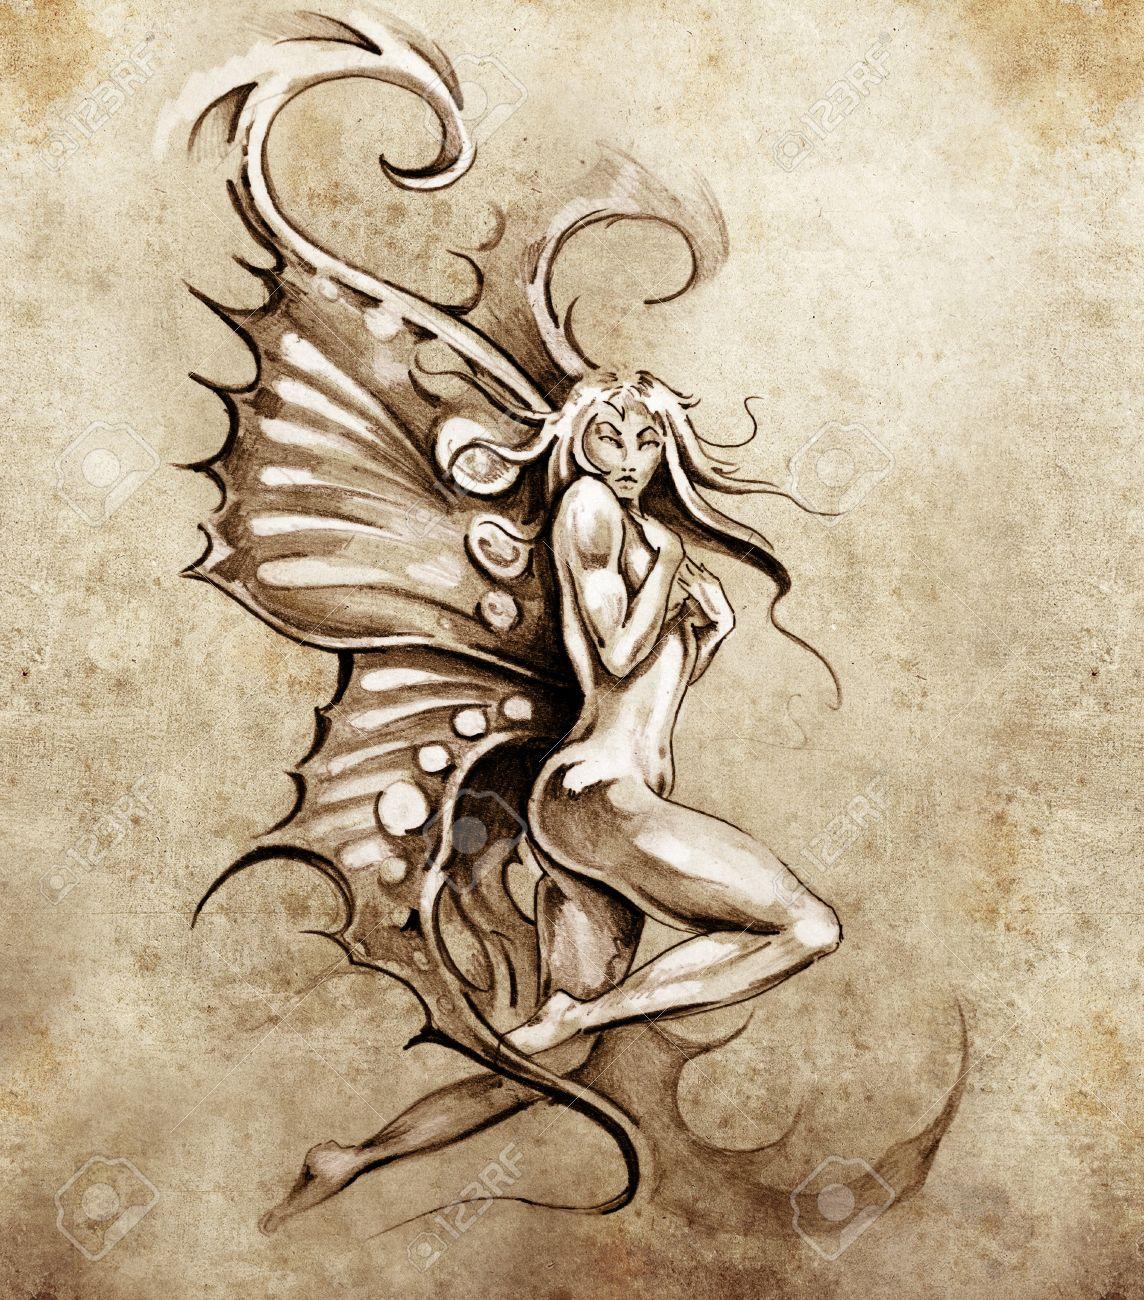 Nude fairy drawings Nude Photos 49